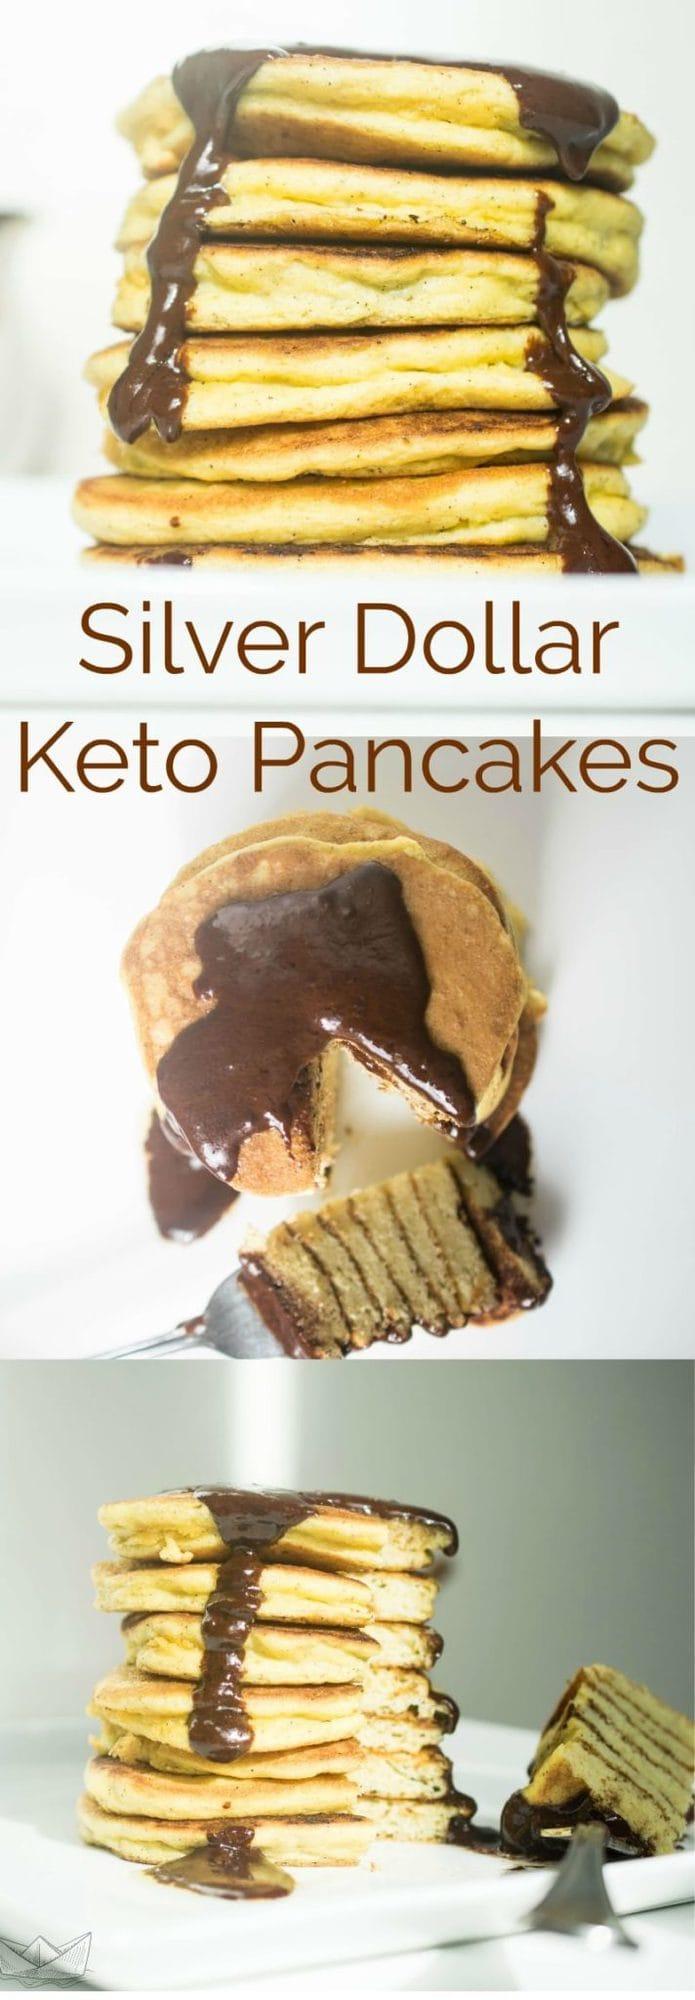 Silver Dollar Keto Pancakes | Peace Love and Low Carb #keto #lowcarb #pancakes #lchf #hflc #recipes